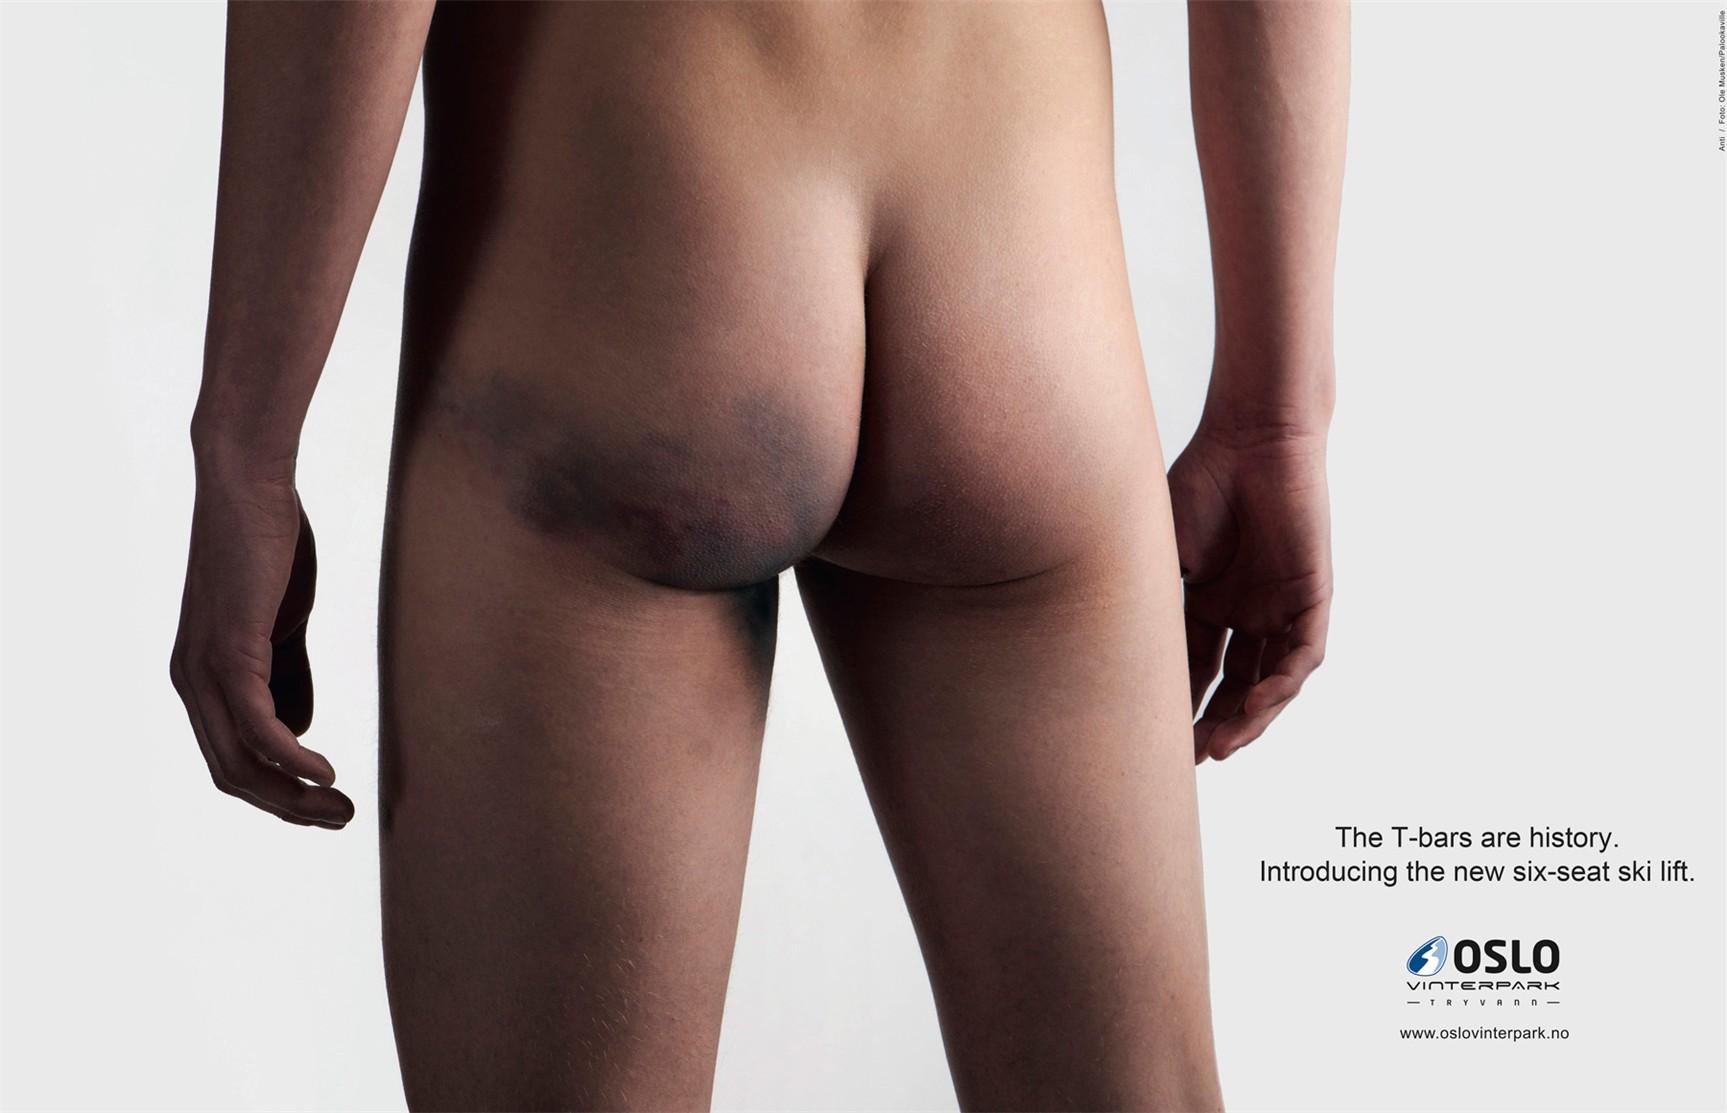 синяк на попе - рекламная кампания Oslo Winterpark